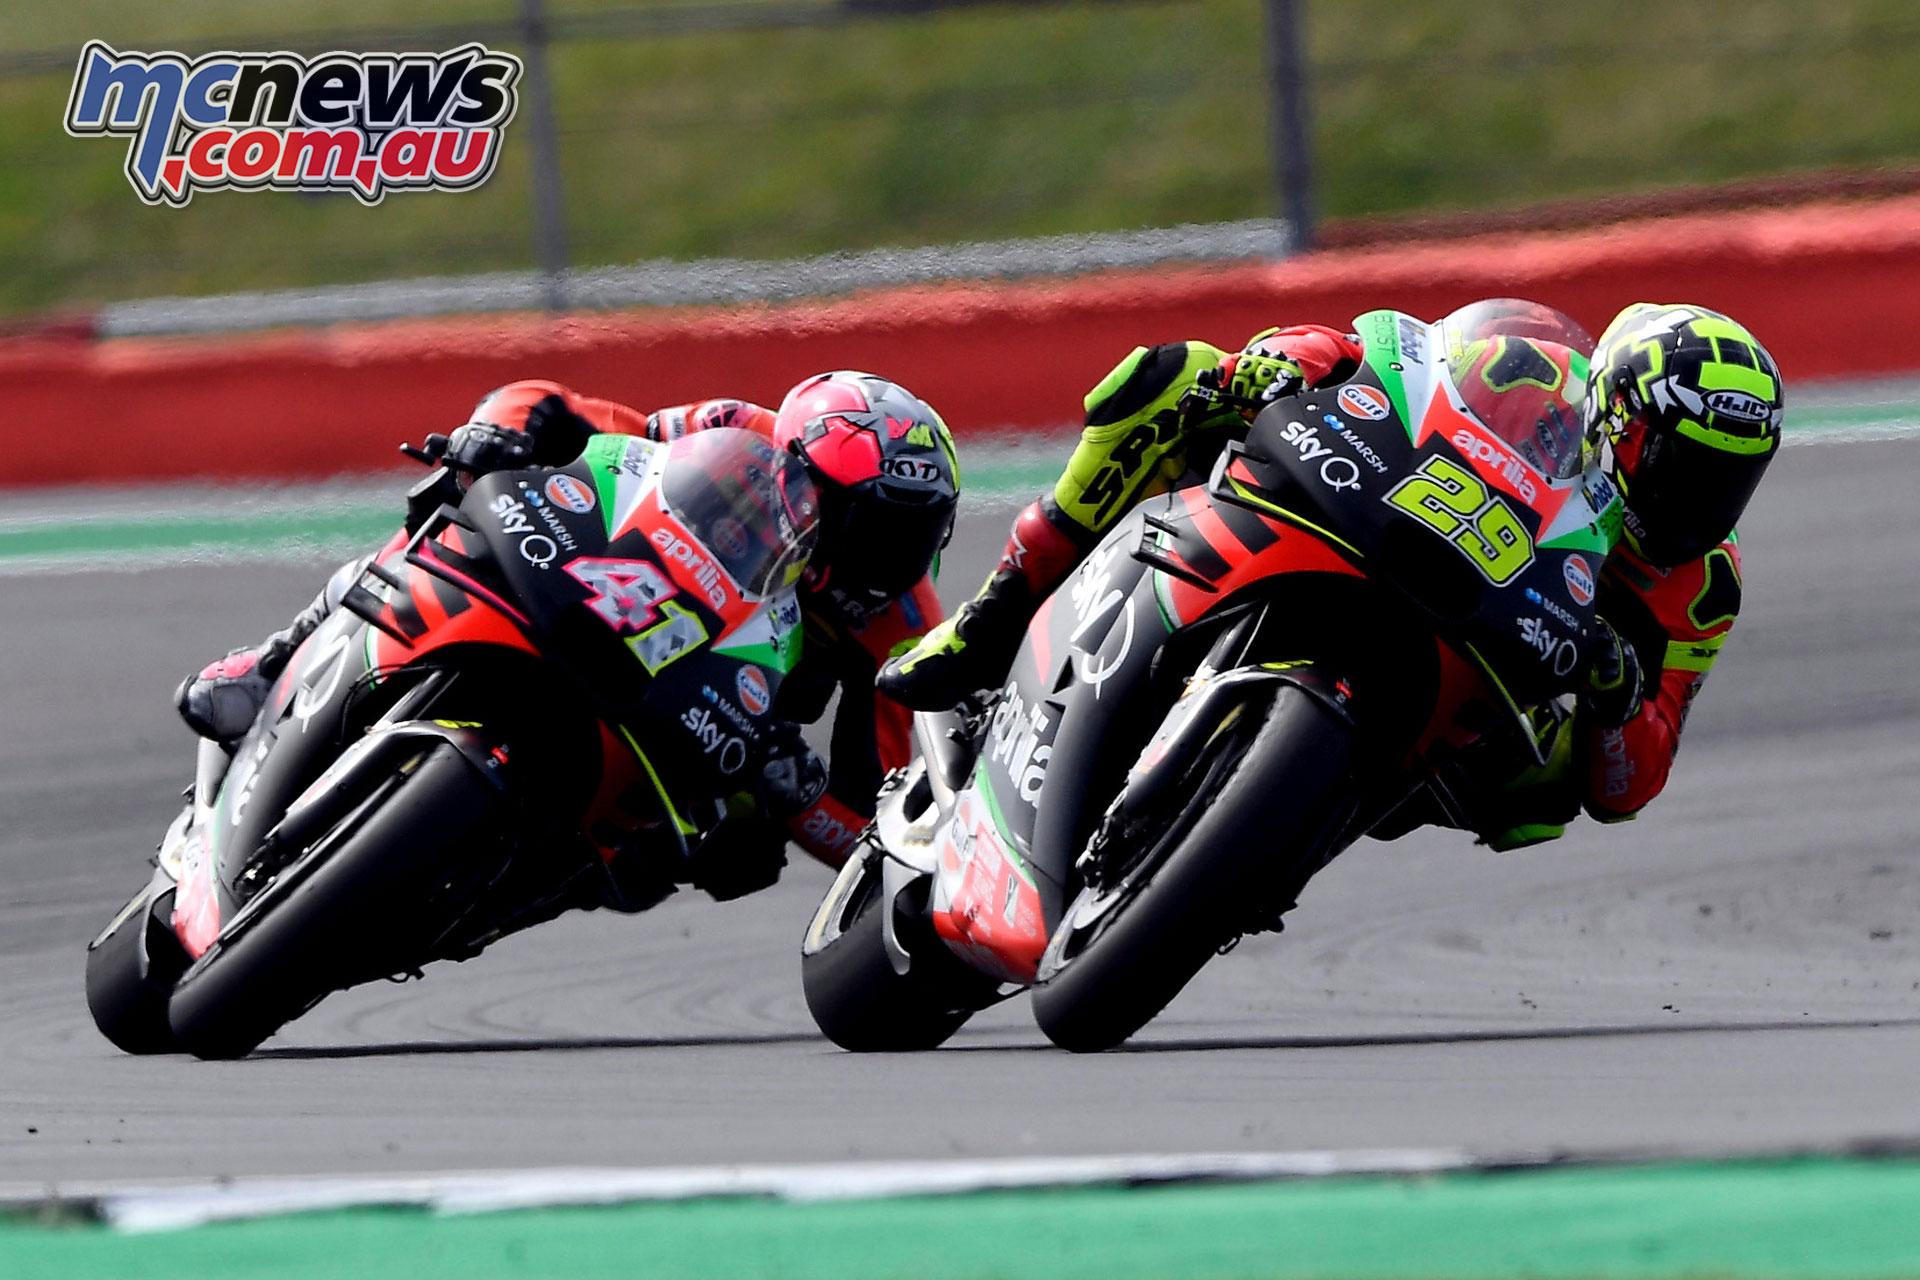 MotoGP Rnd Silverstone Andrea Iannone